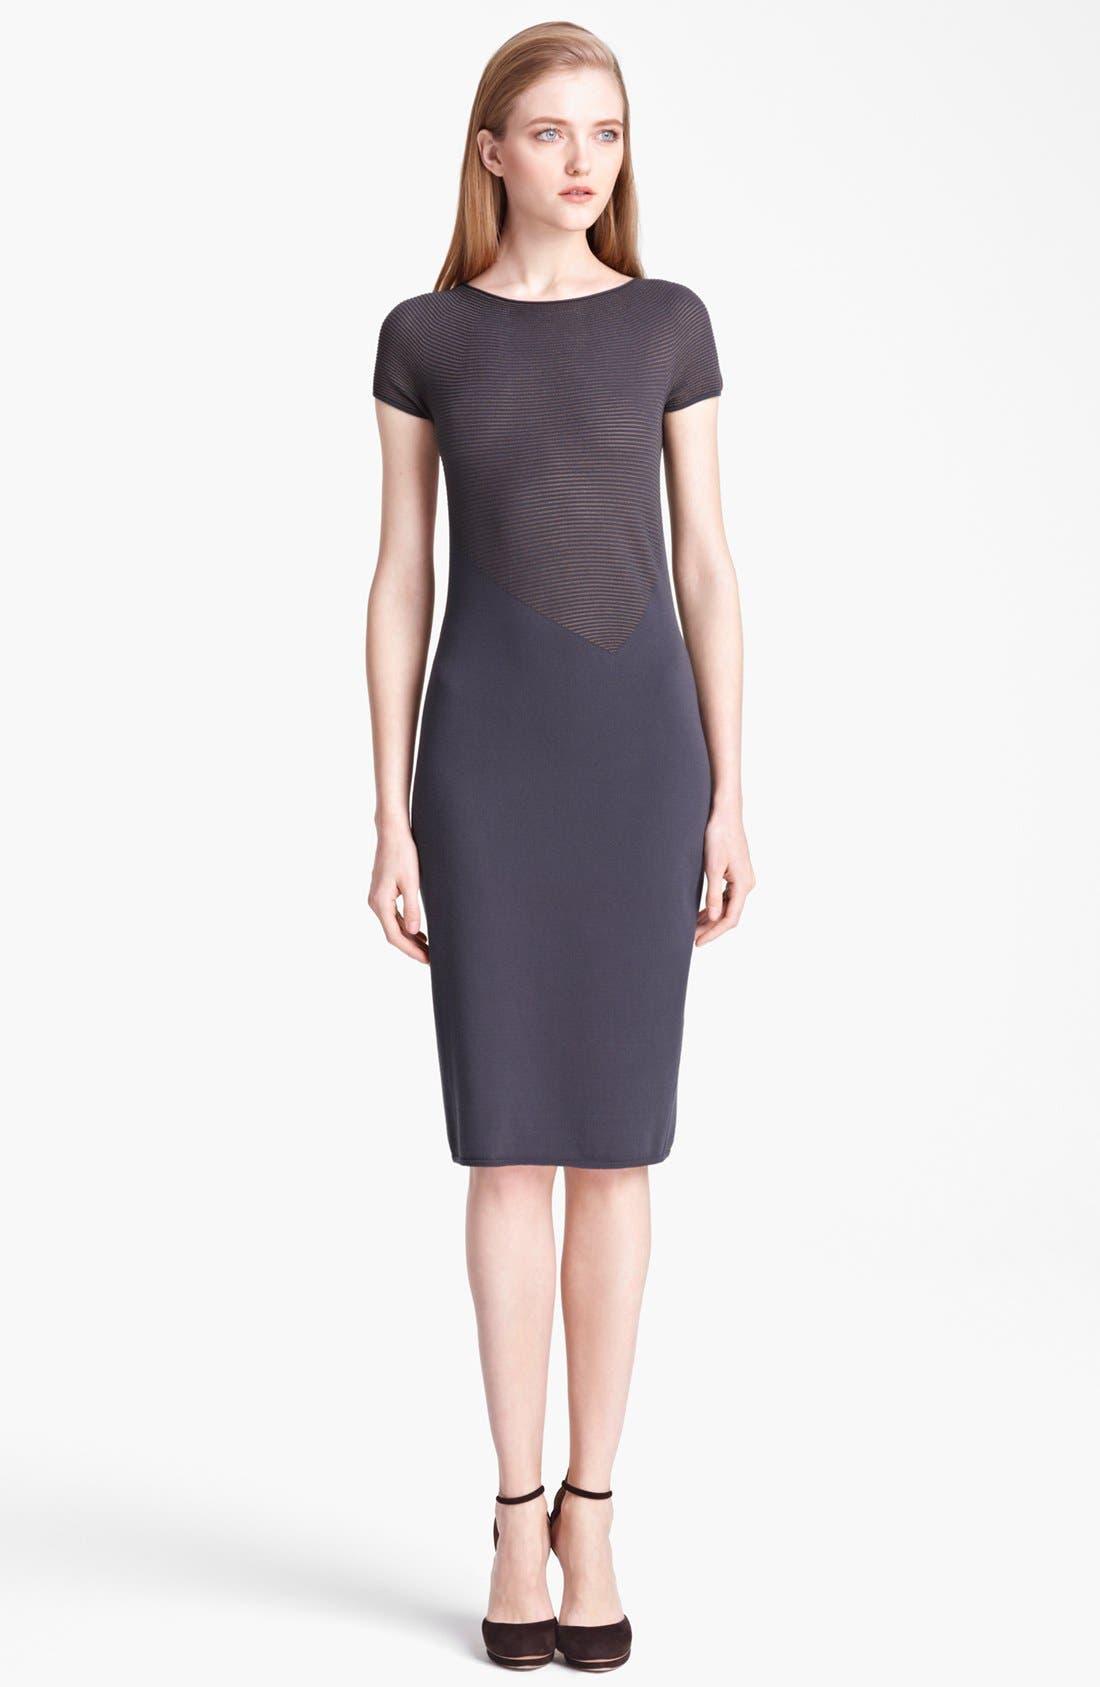 Alternate Image 1 Selected - Armani Collezioni Microstripe Jersey Dress